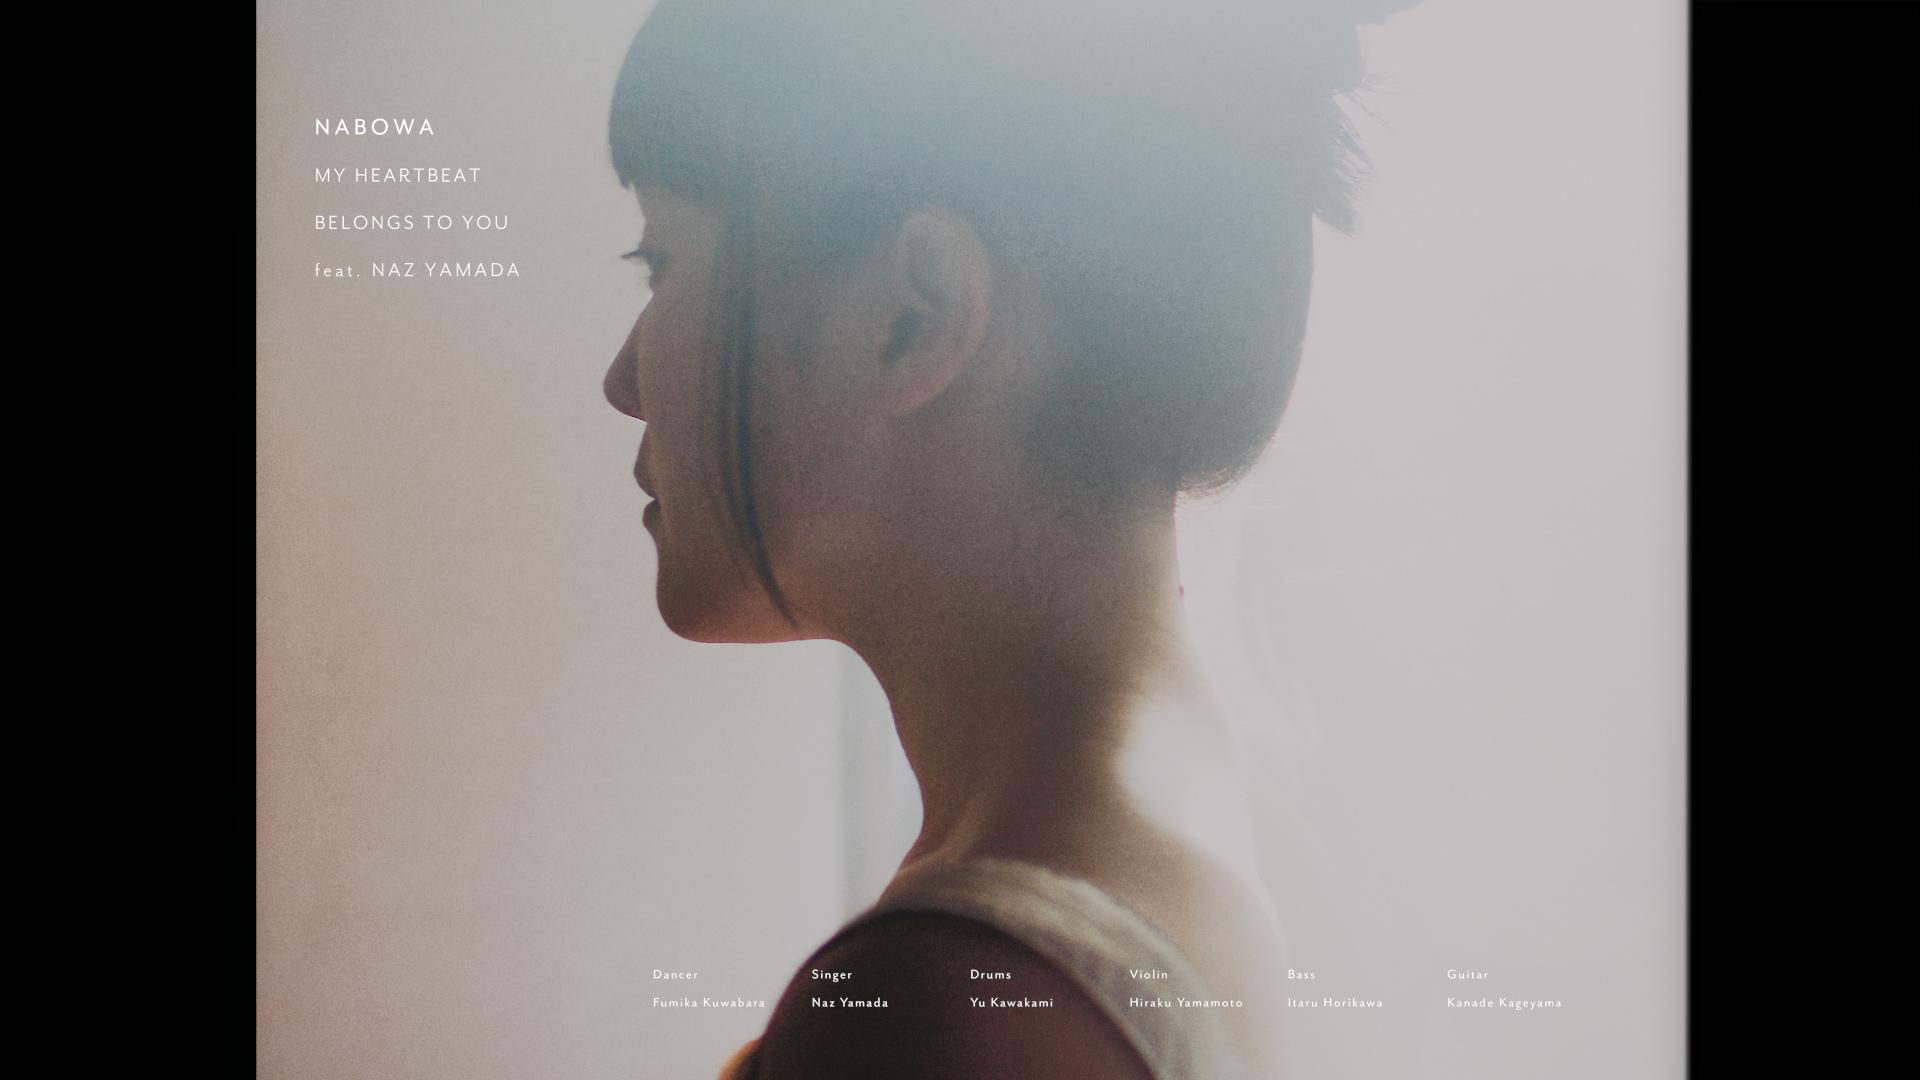 "NABOWA_My Heartbeat (Belong To You)feat. å±±ç""°ãªã¥.mp4.00_00_21_22.Still002.jpg"